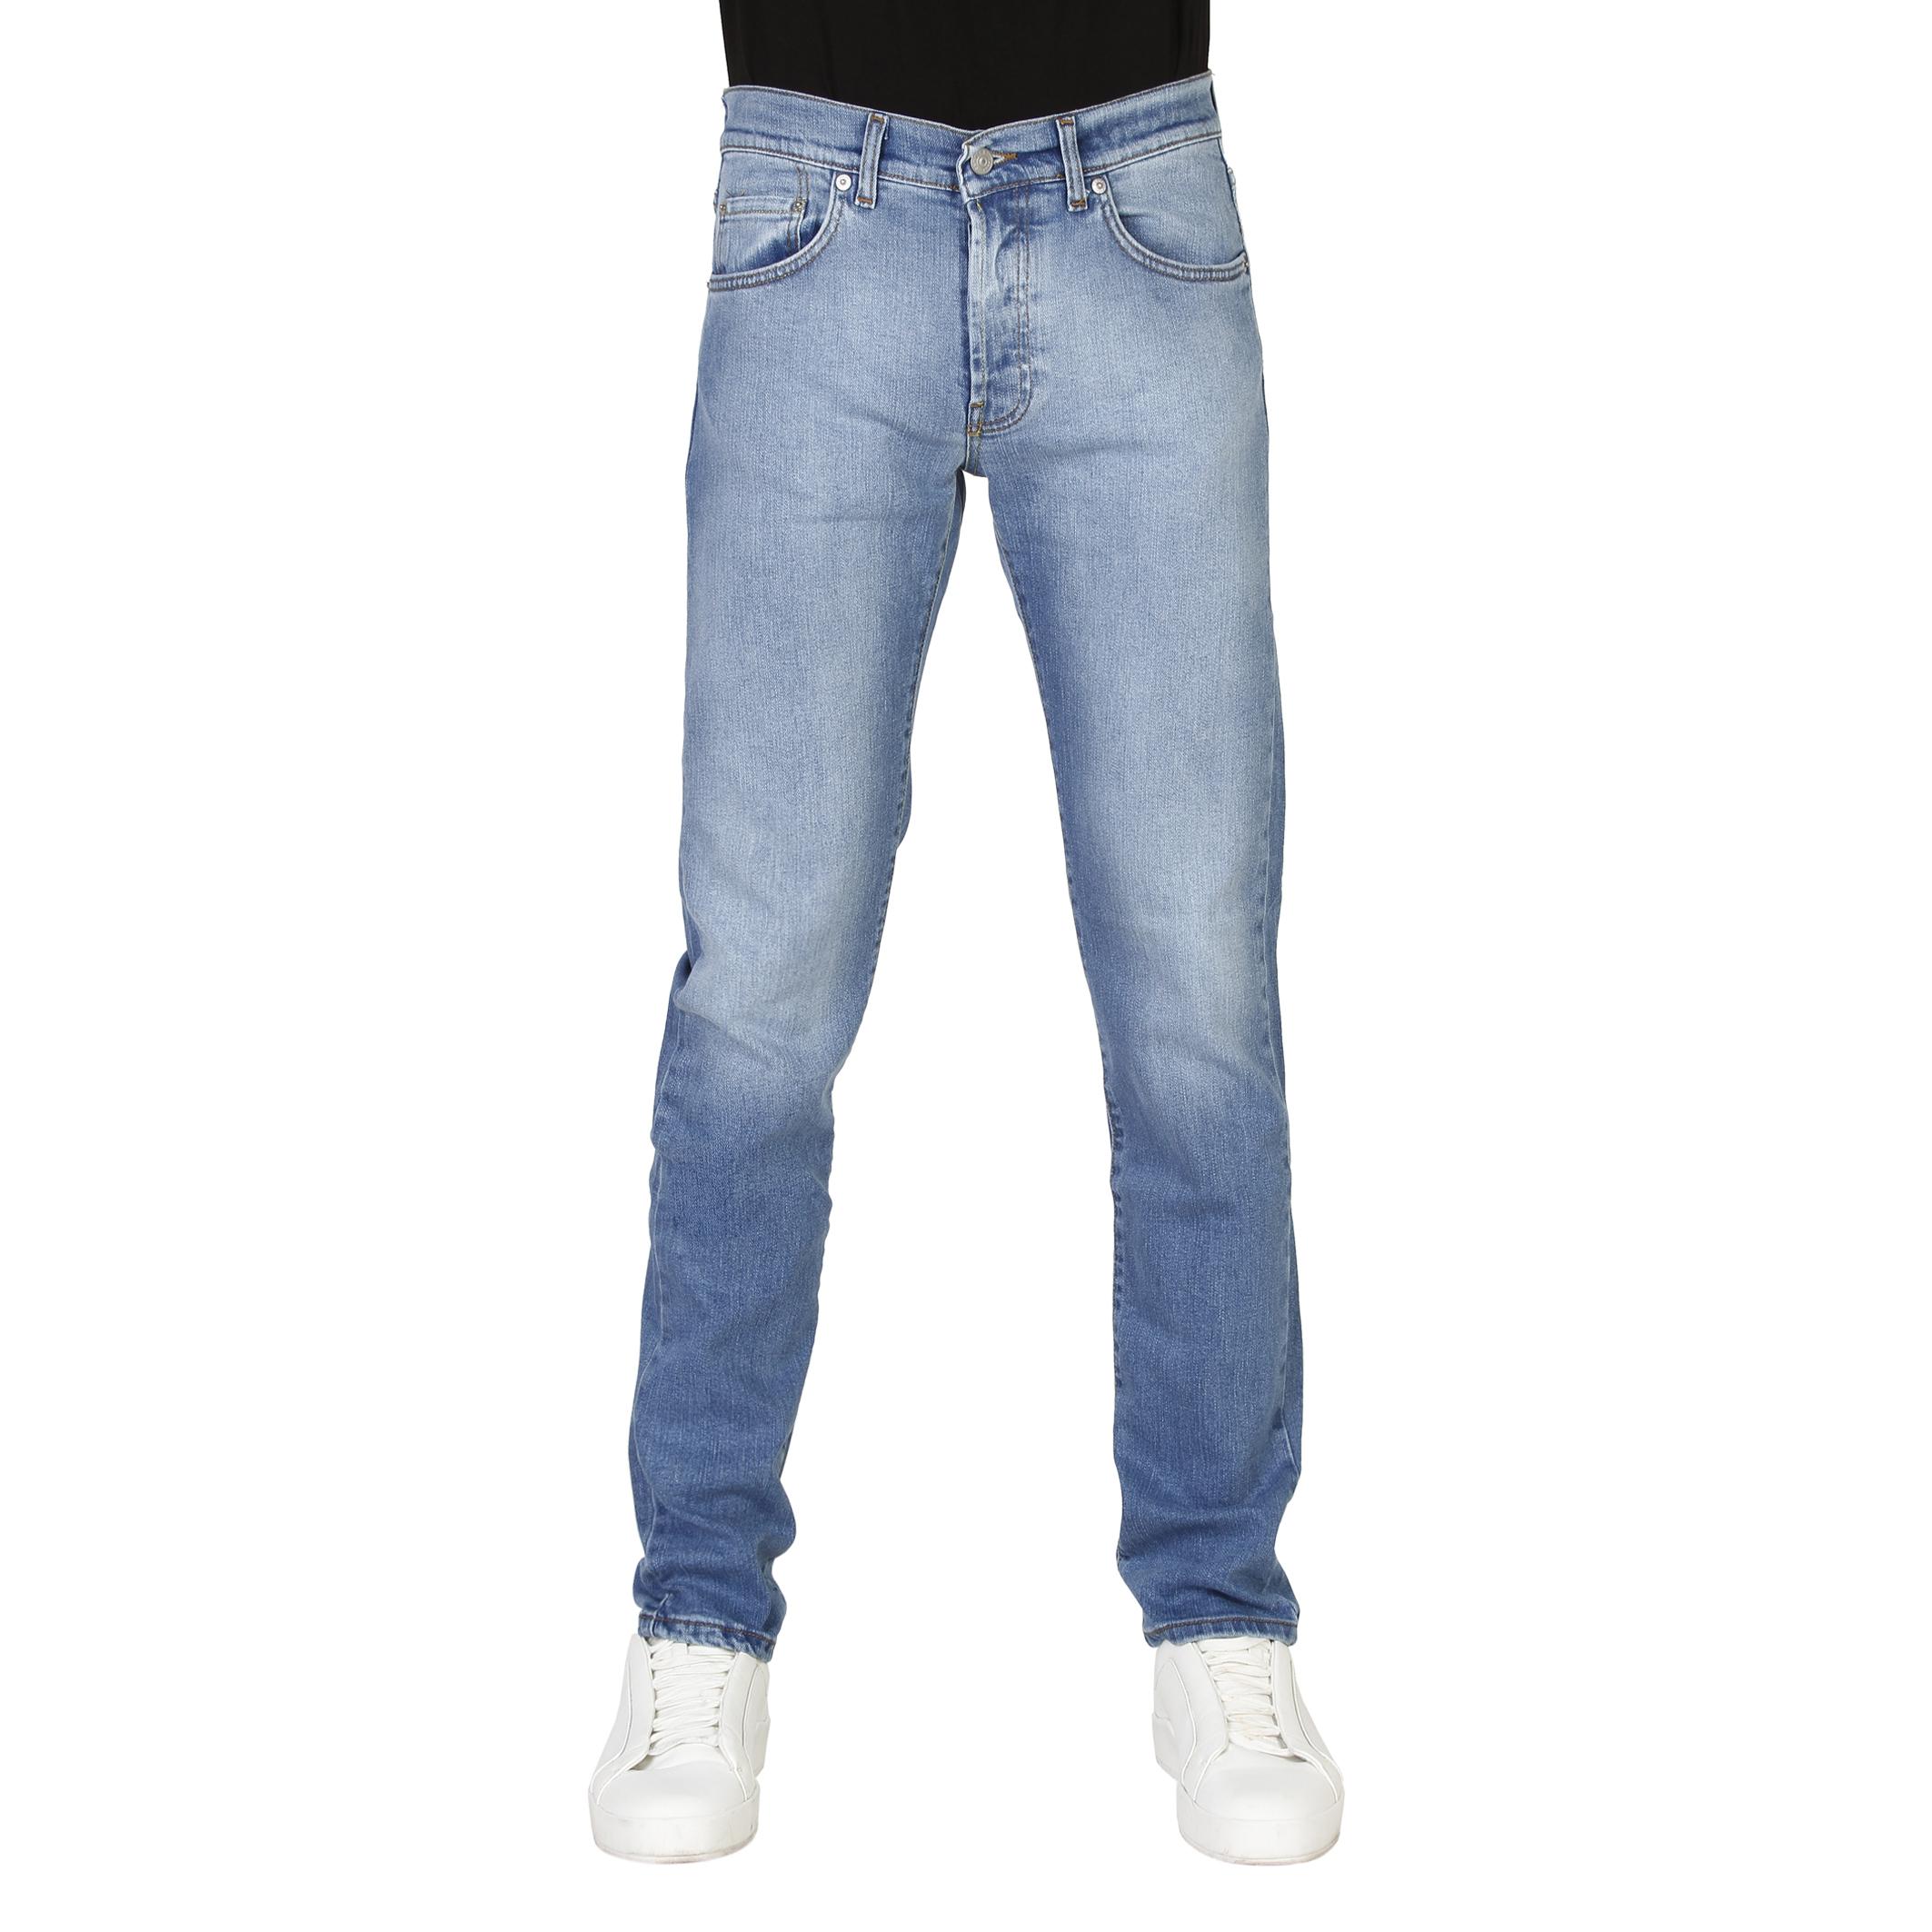 Carrera Jeans 000710 0970A